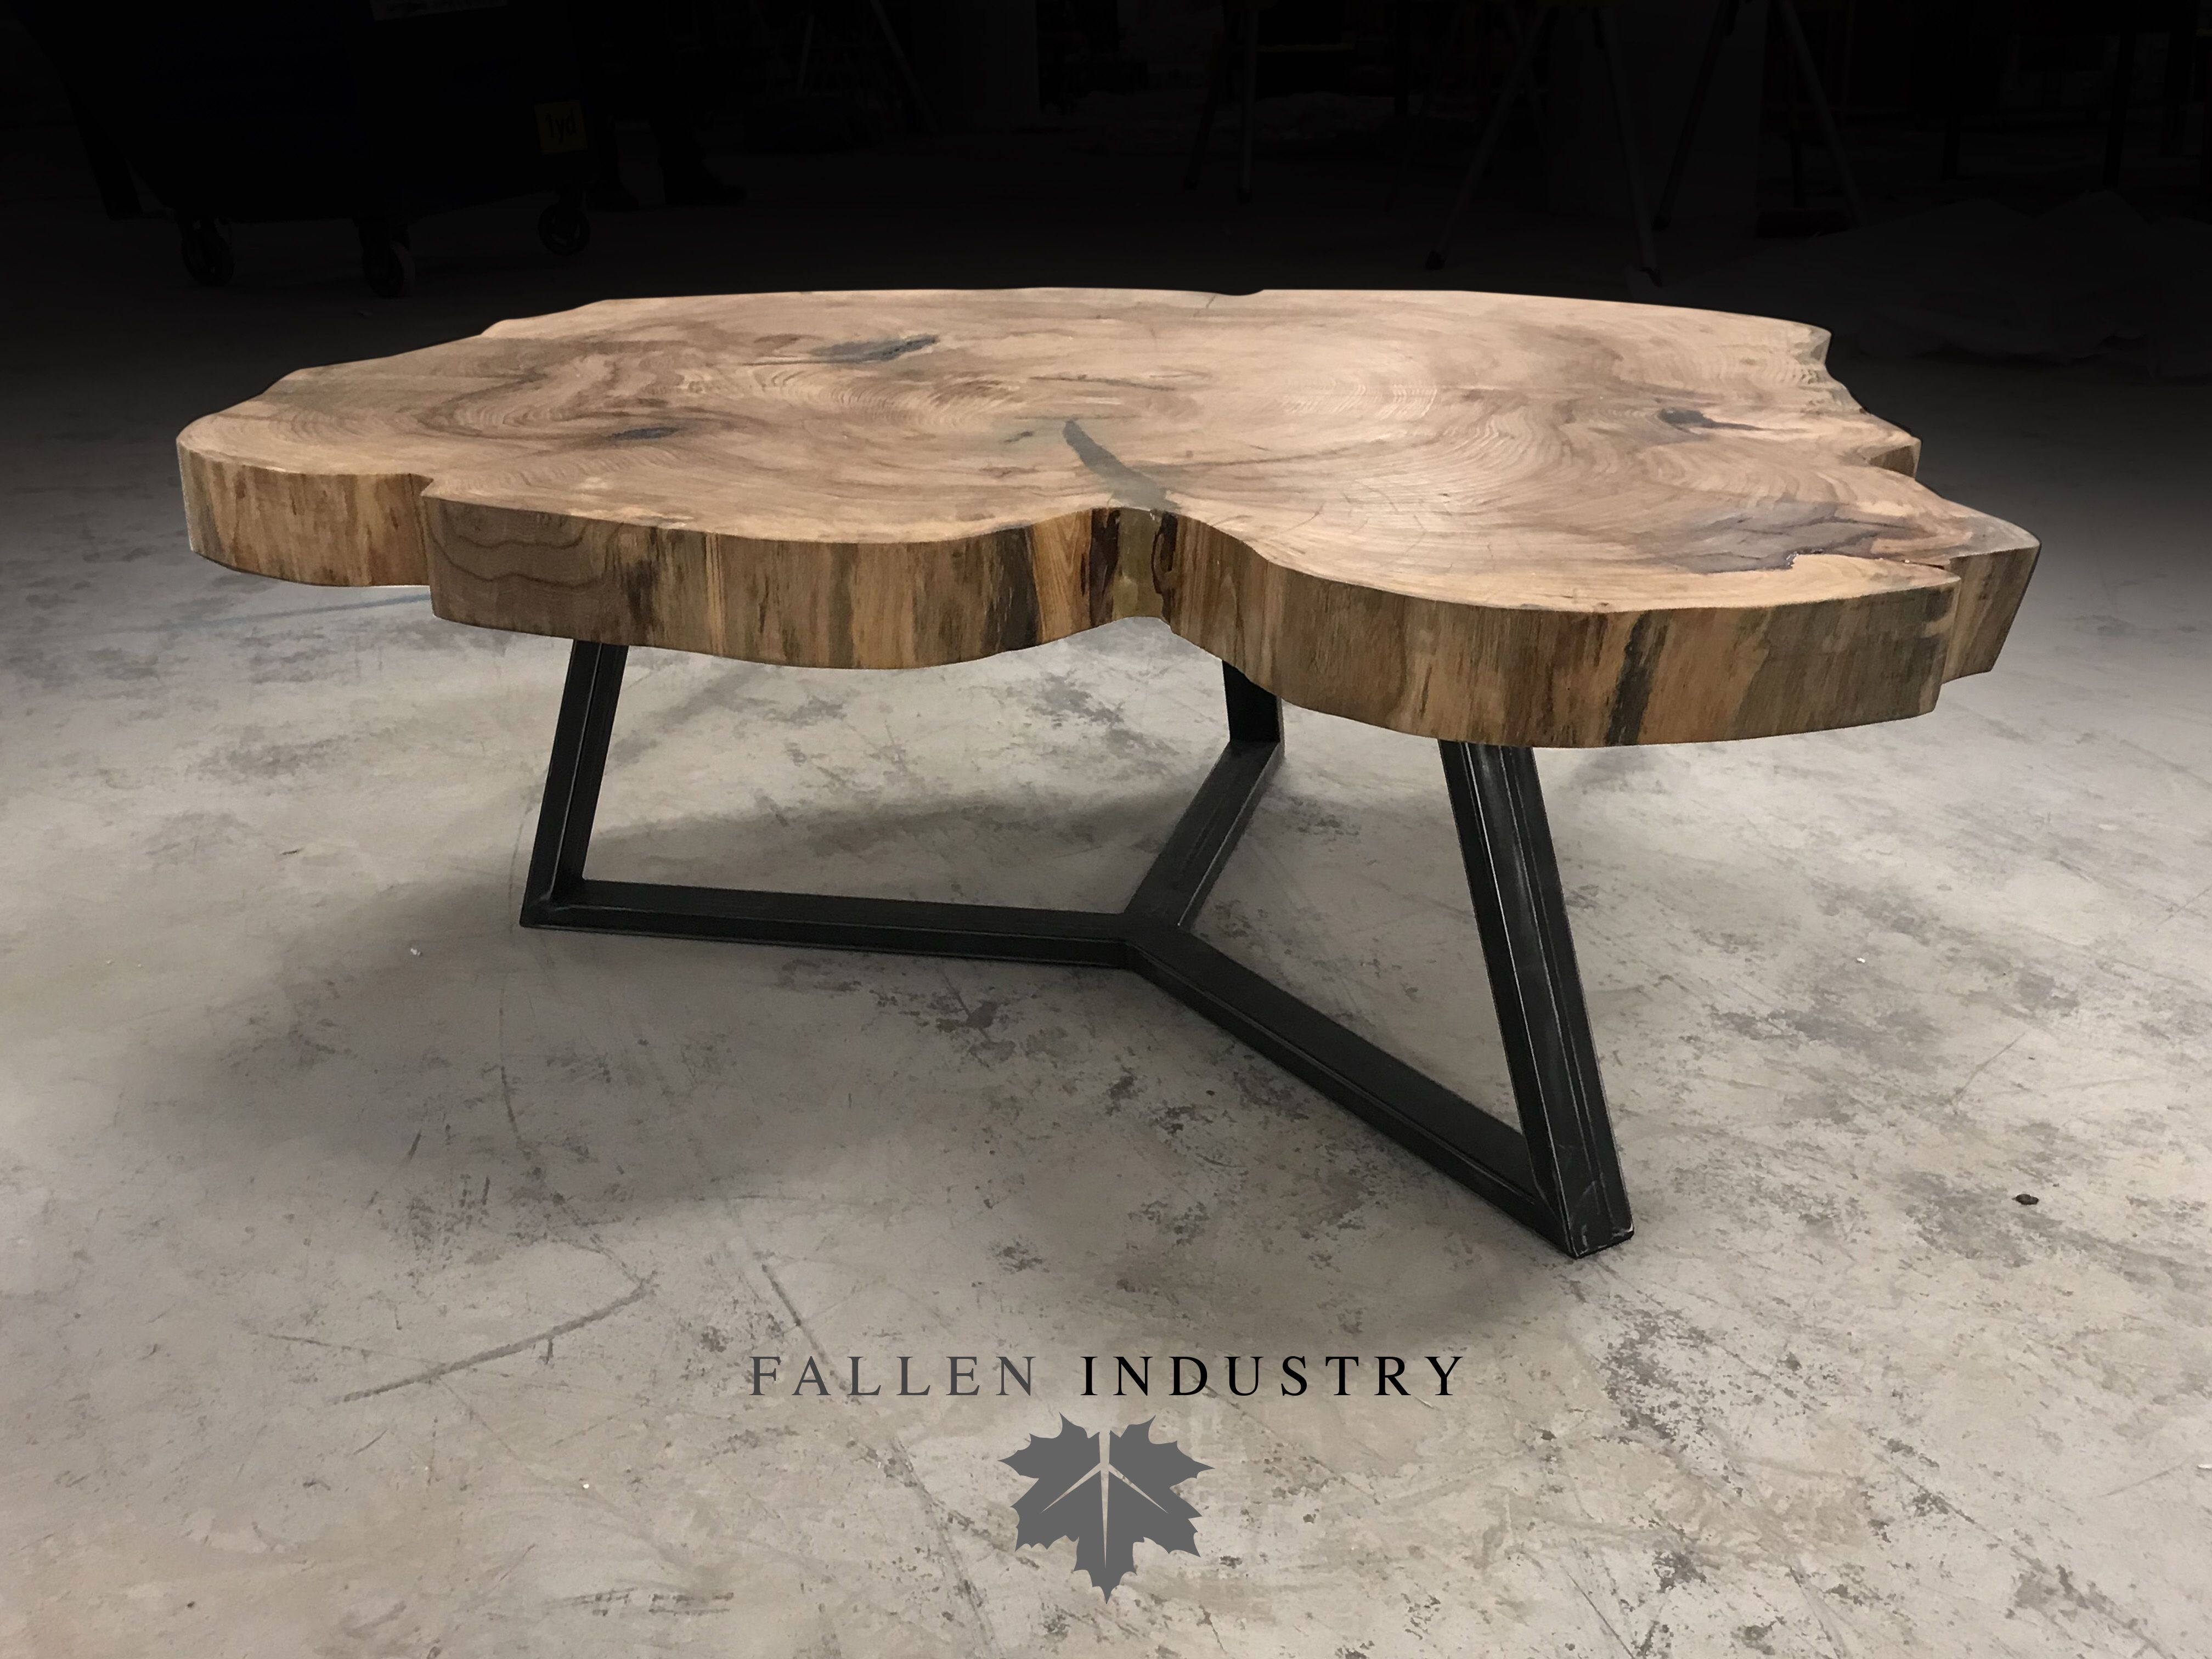 Union Coffee Table Live Edge Furniture Wood Table Design Live Edge Coffee Table [ 3024 x 4032 Pixel ]